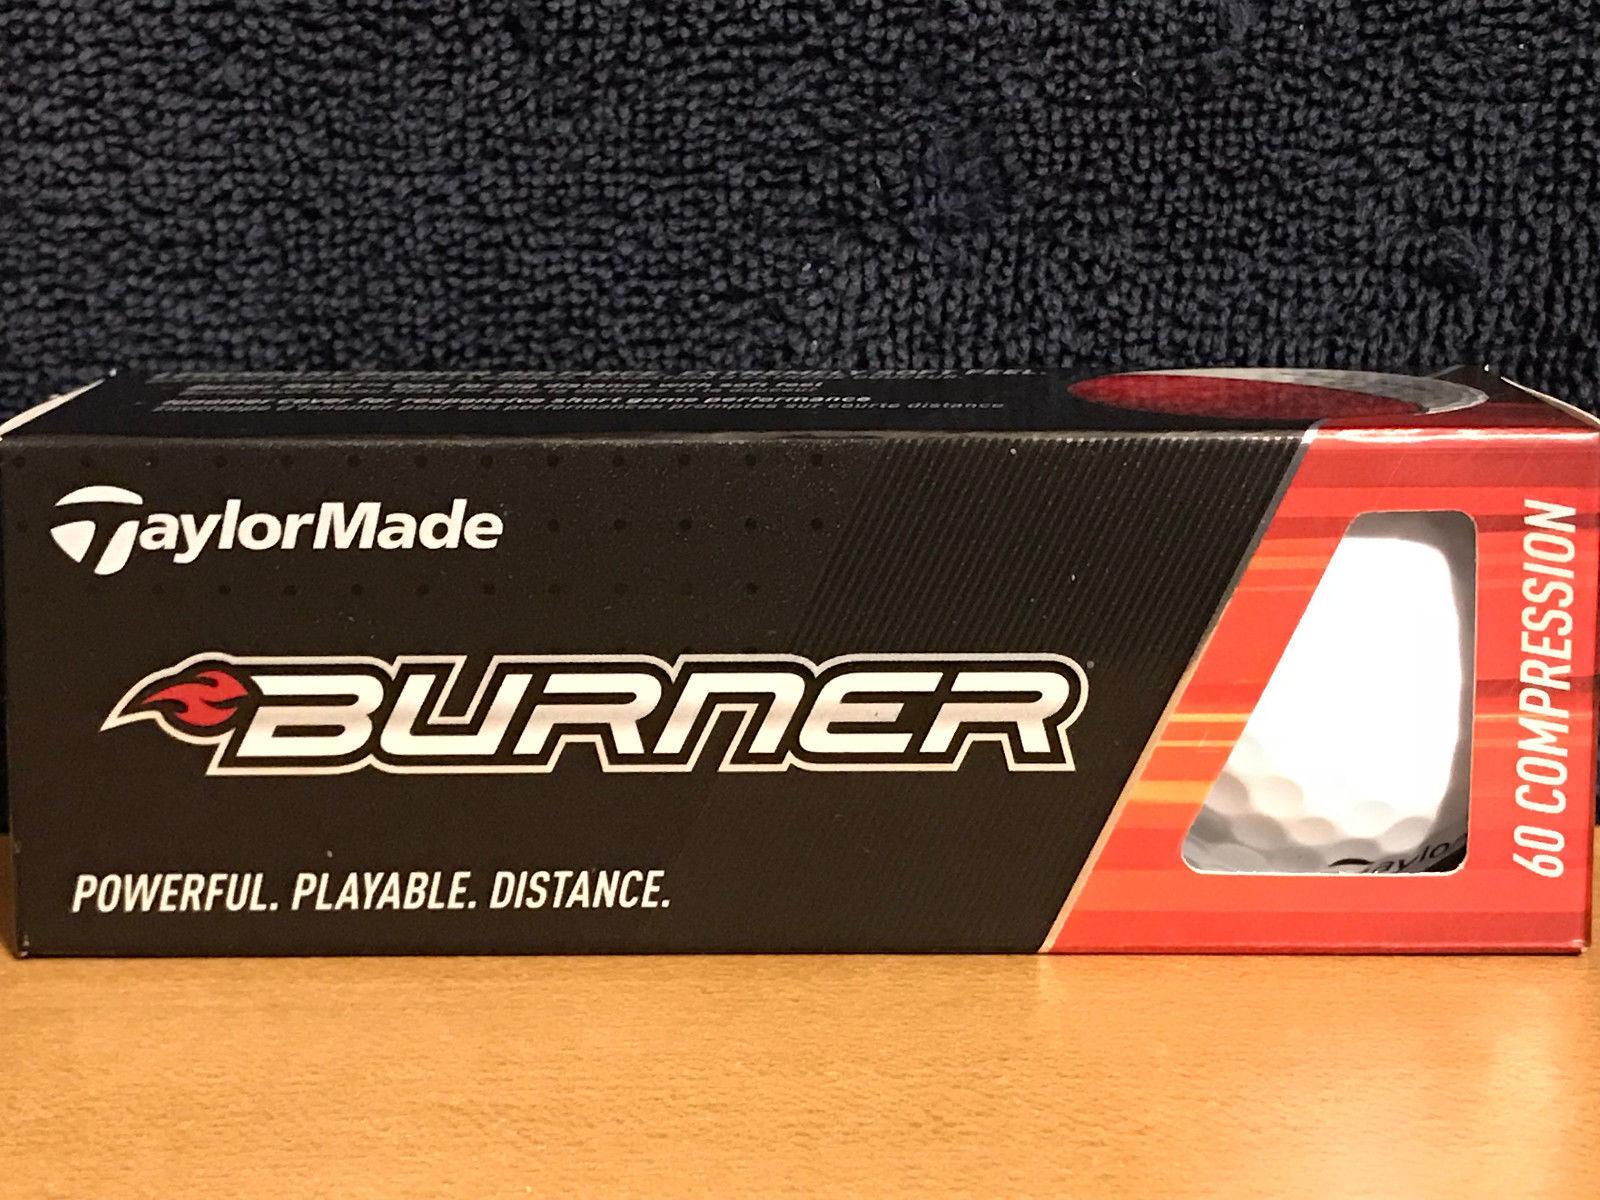 TaylorMade Burner 60 Compression  3pk Golf Balls NIB!